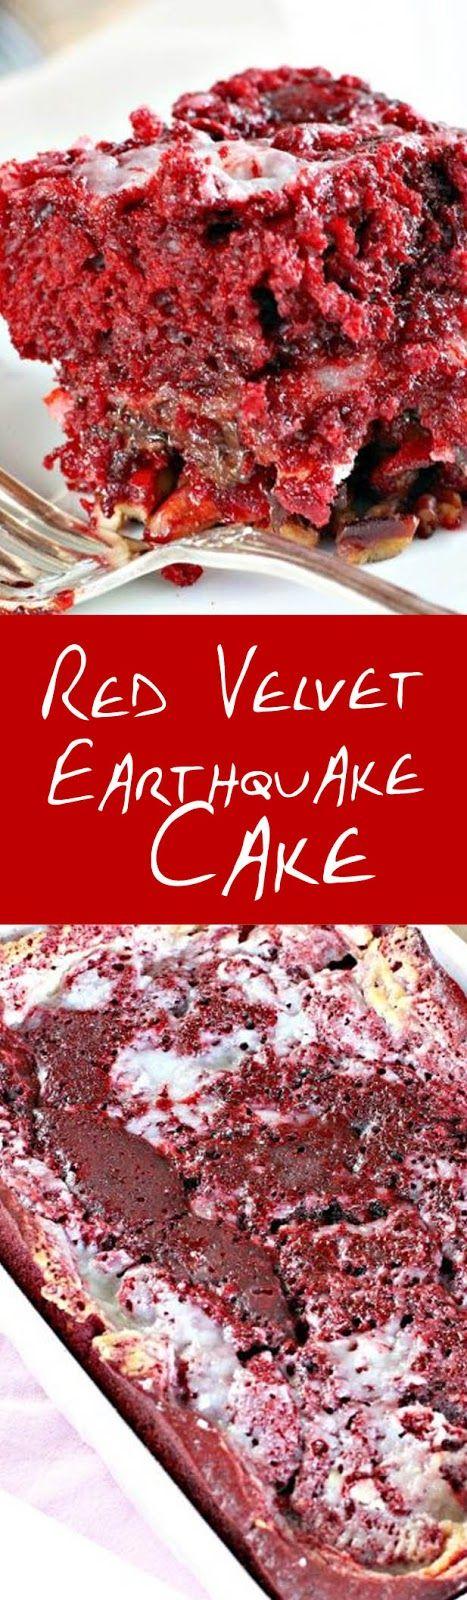 Red Velvet Earthquake Cake Earthquake Cake Recipes Earthquake Cake